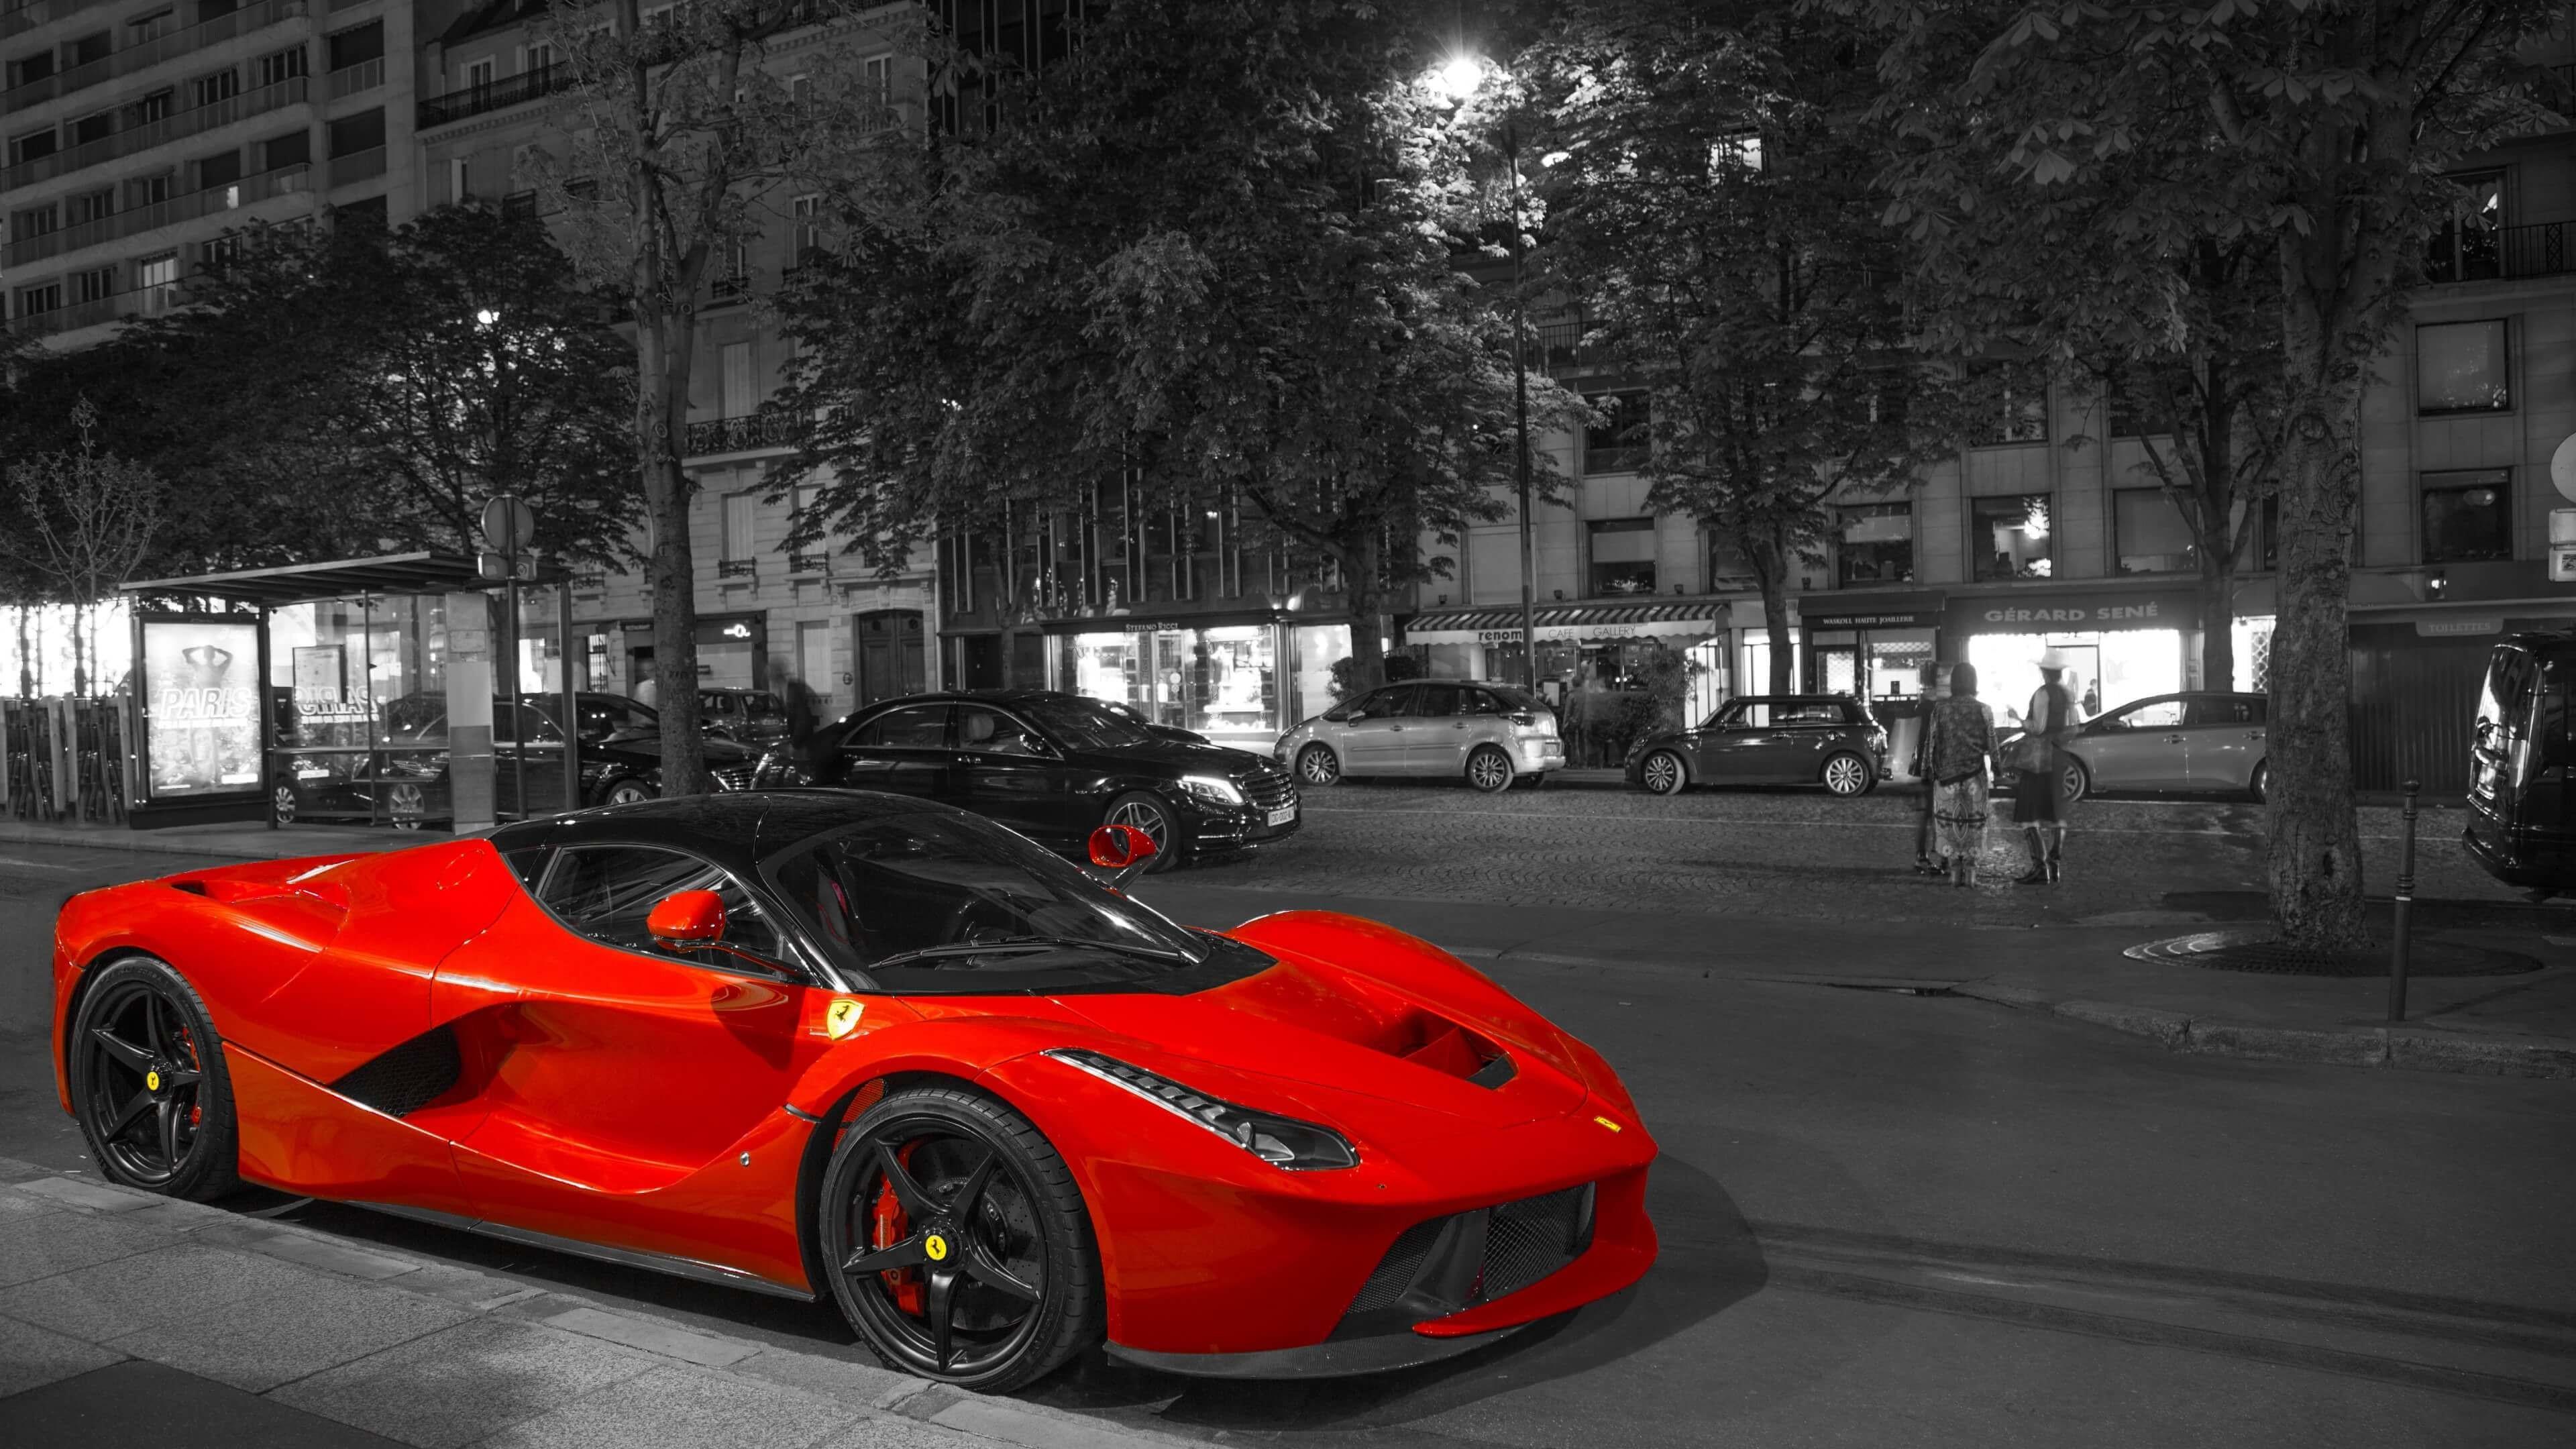 Ferrari LaFerrari Color Effect wallpaper